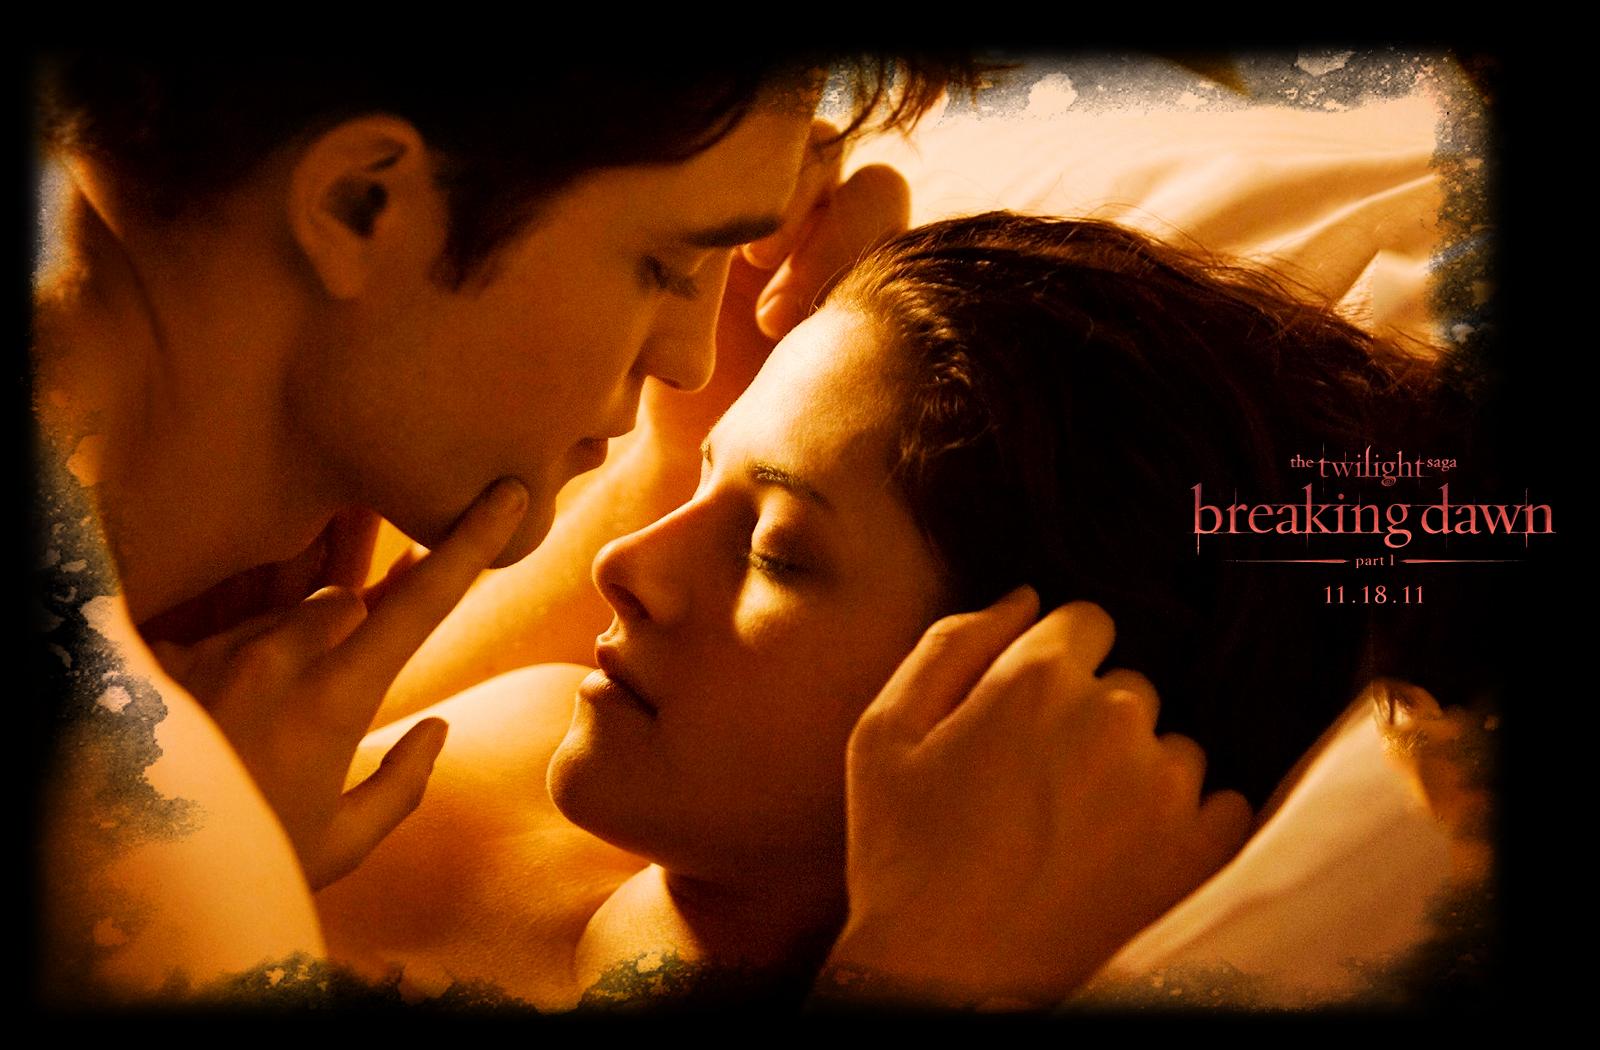 Watch twilight saga breaking dawn online megavideo streaming and.